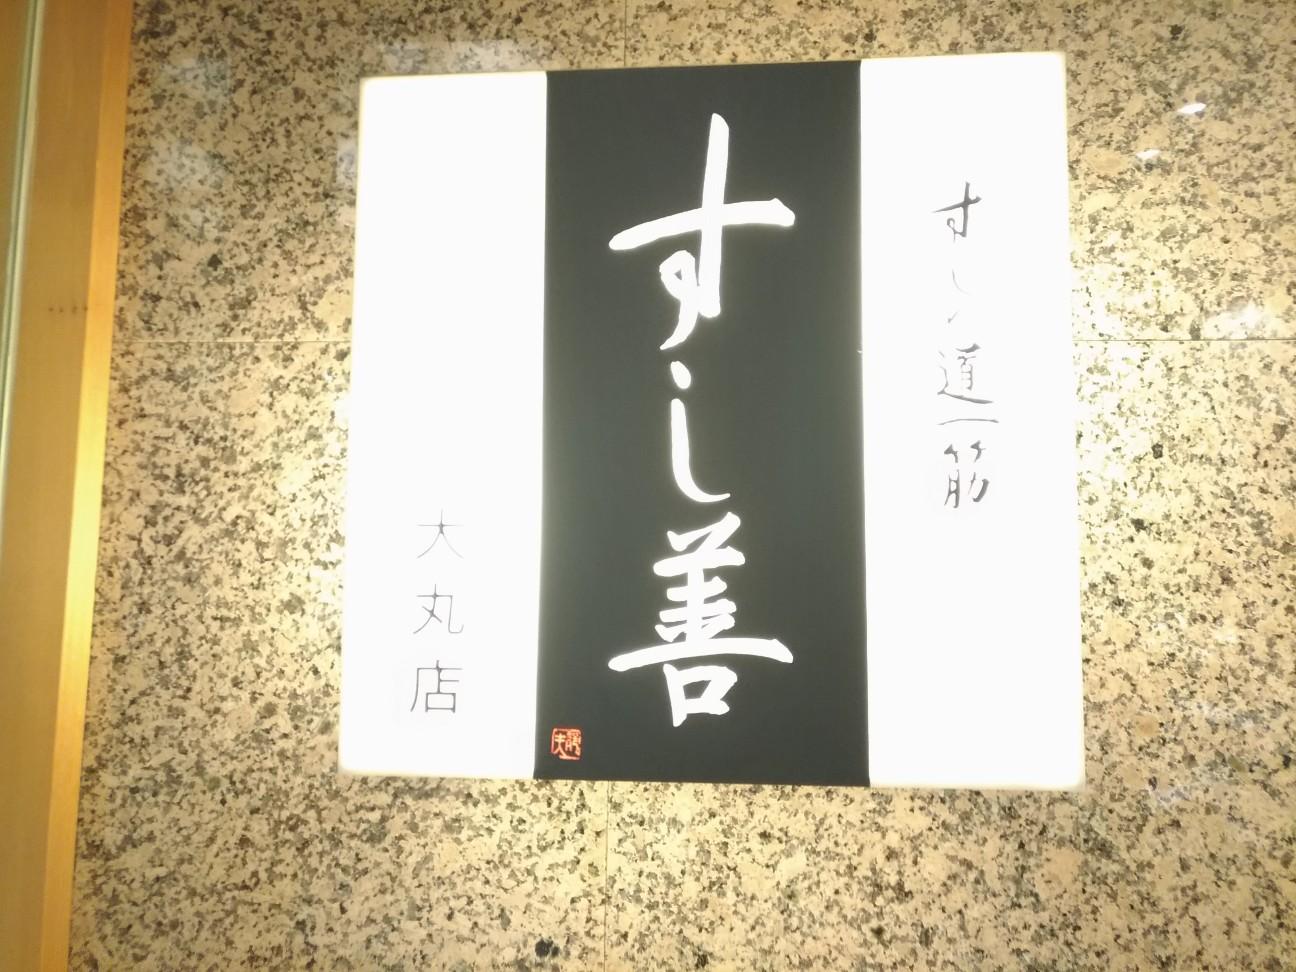 f:id:HKT1989:20200205010725j:image